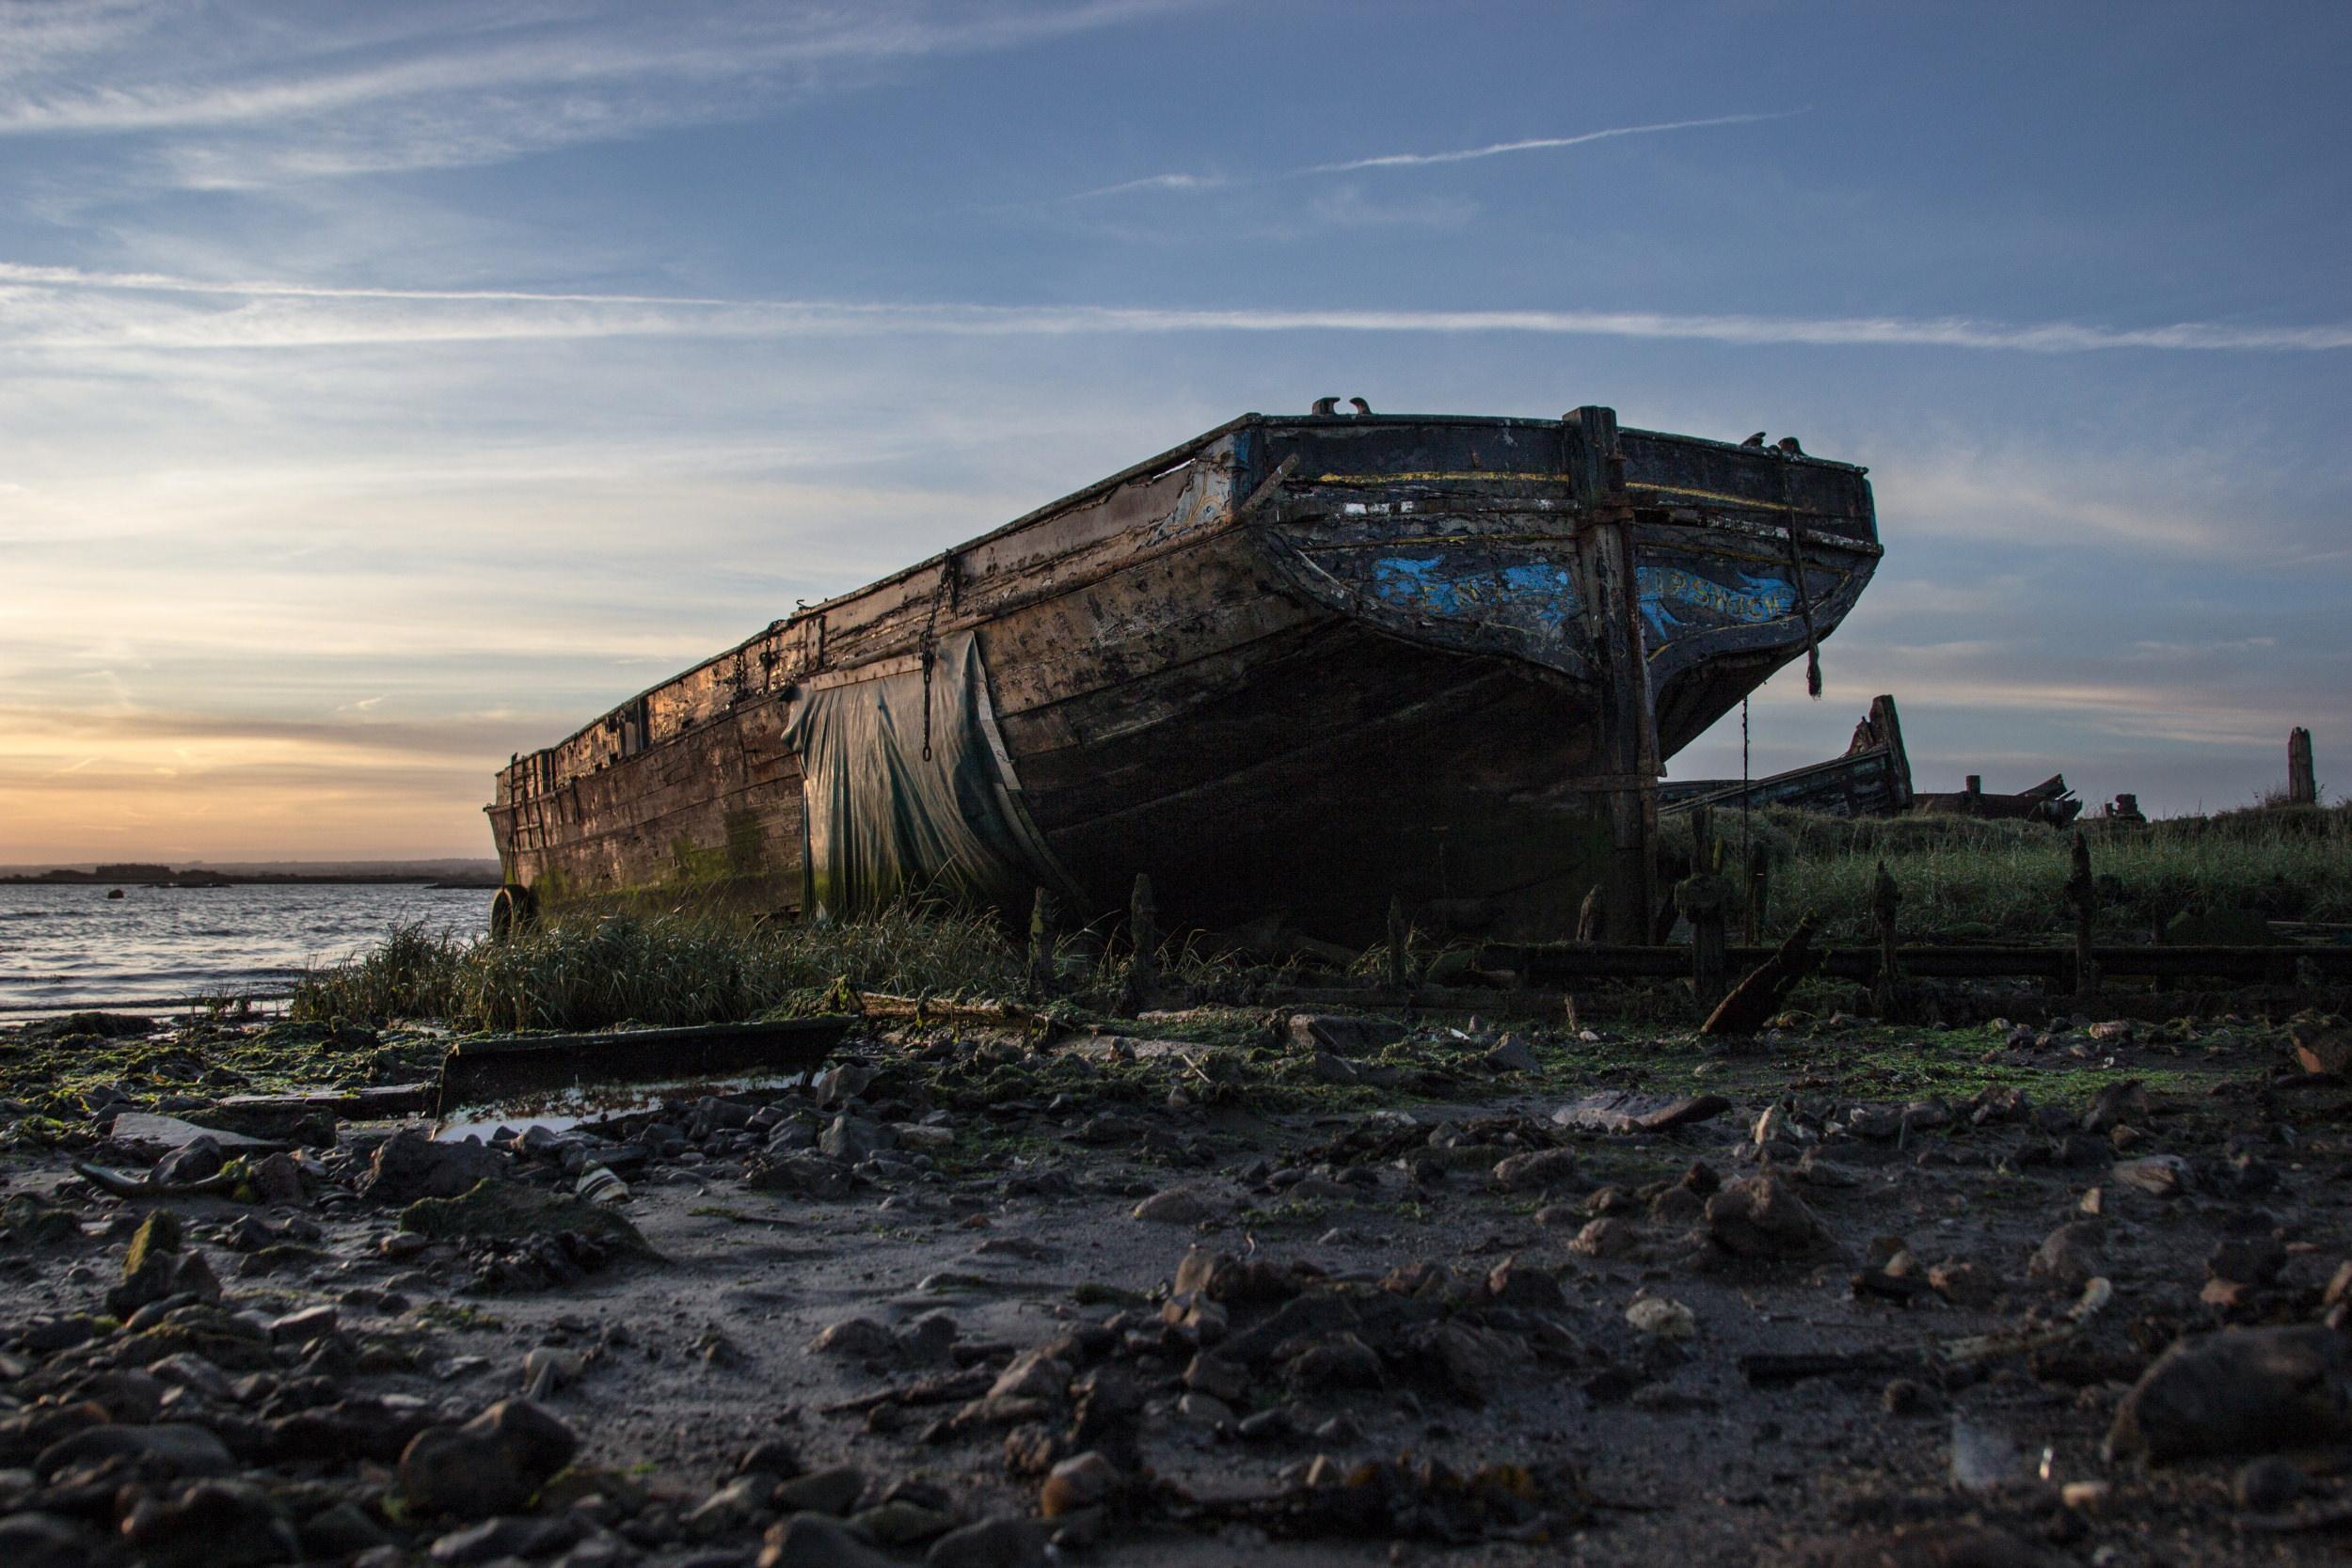 HOO peninsula - Sailing Barge Ena